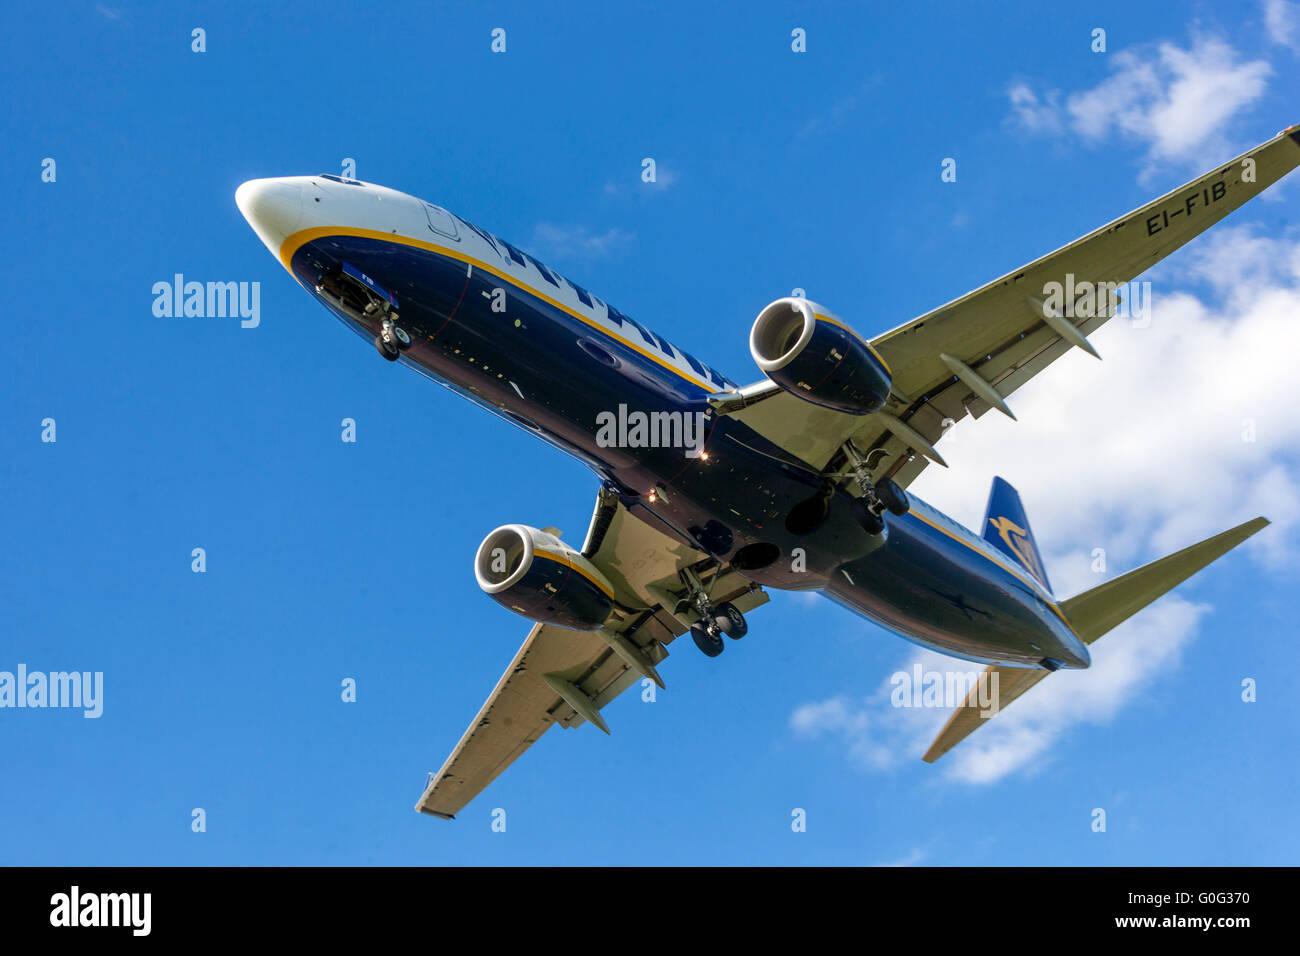 Plane Boeing 737 Ryanair approaching for a landing, Vaclav Havel Airport, Ruzyne Prague, Czech Republic - Stock Image